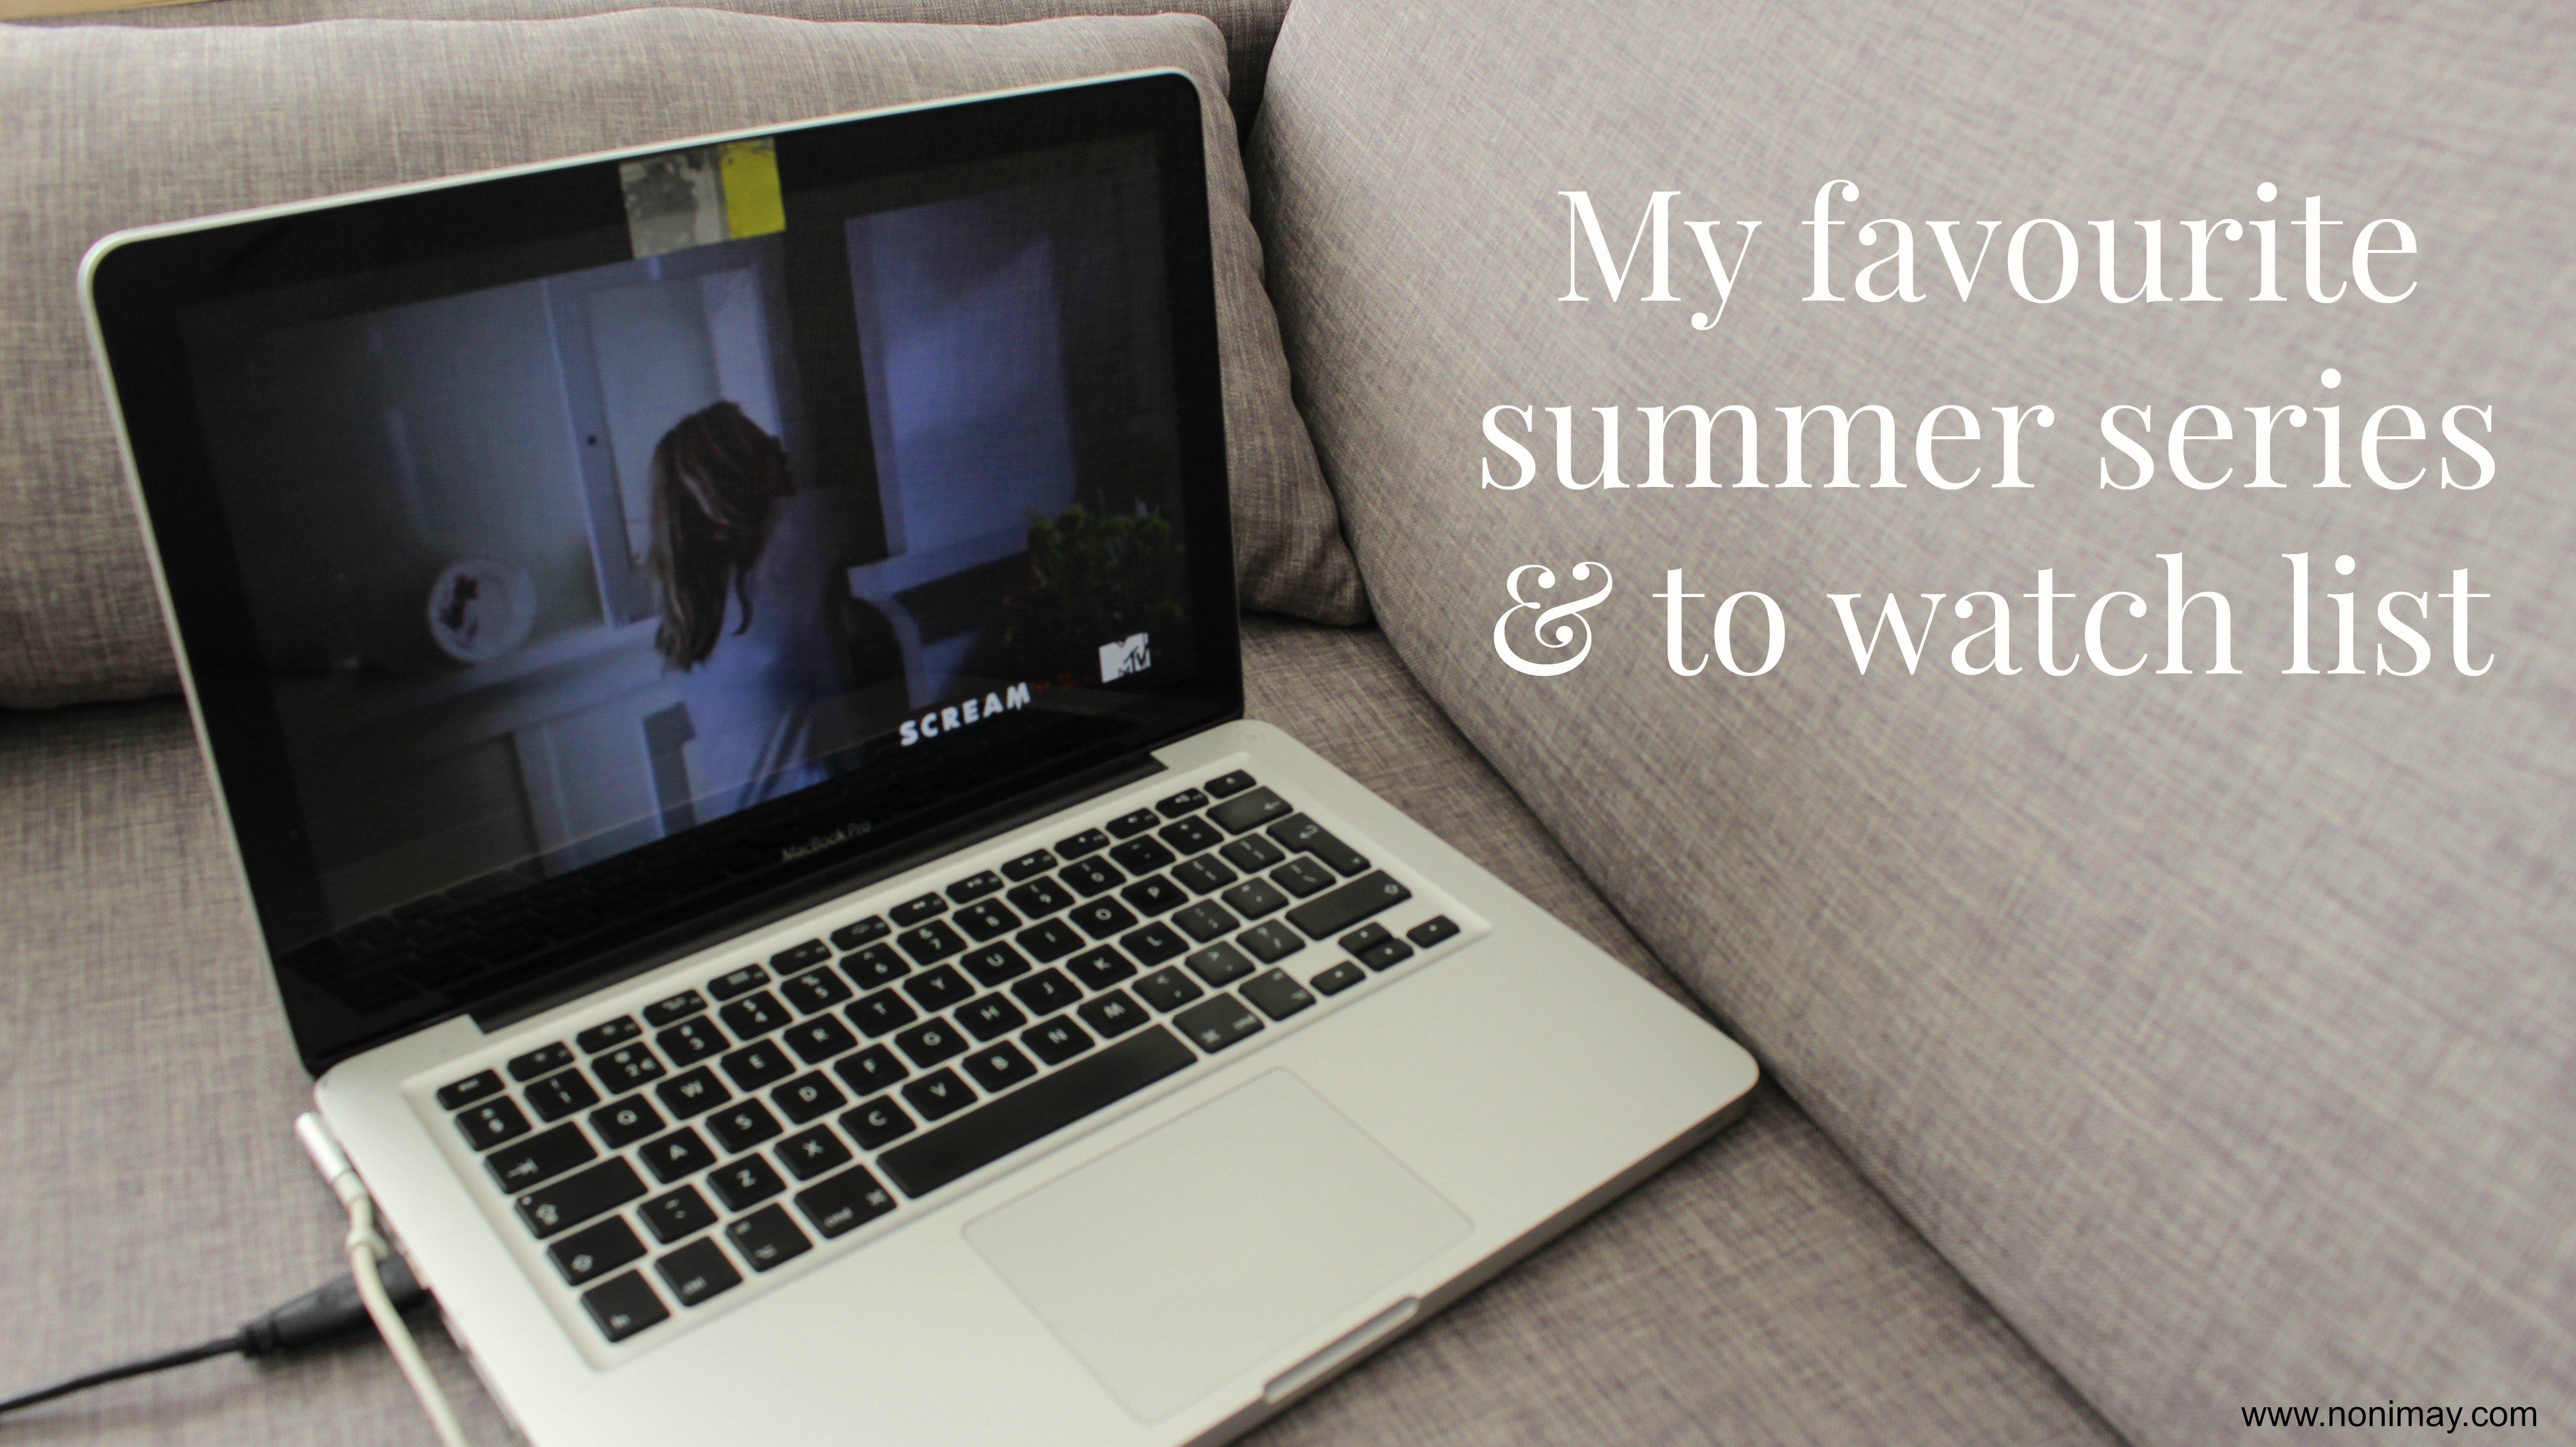 My favourite summer series & to watch list